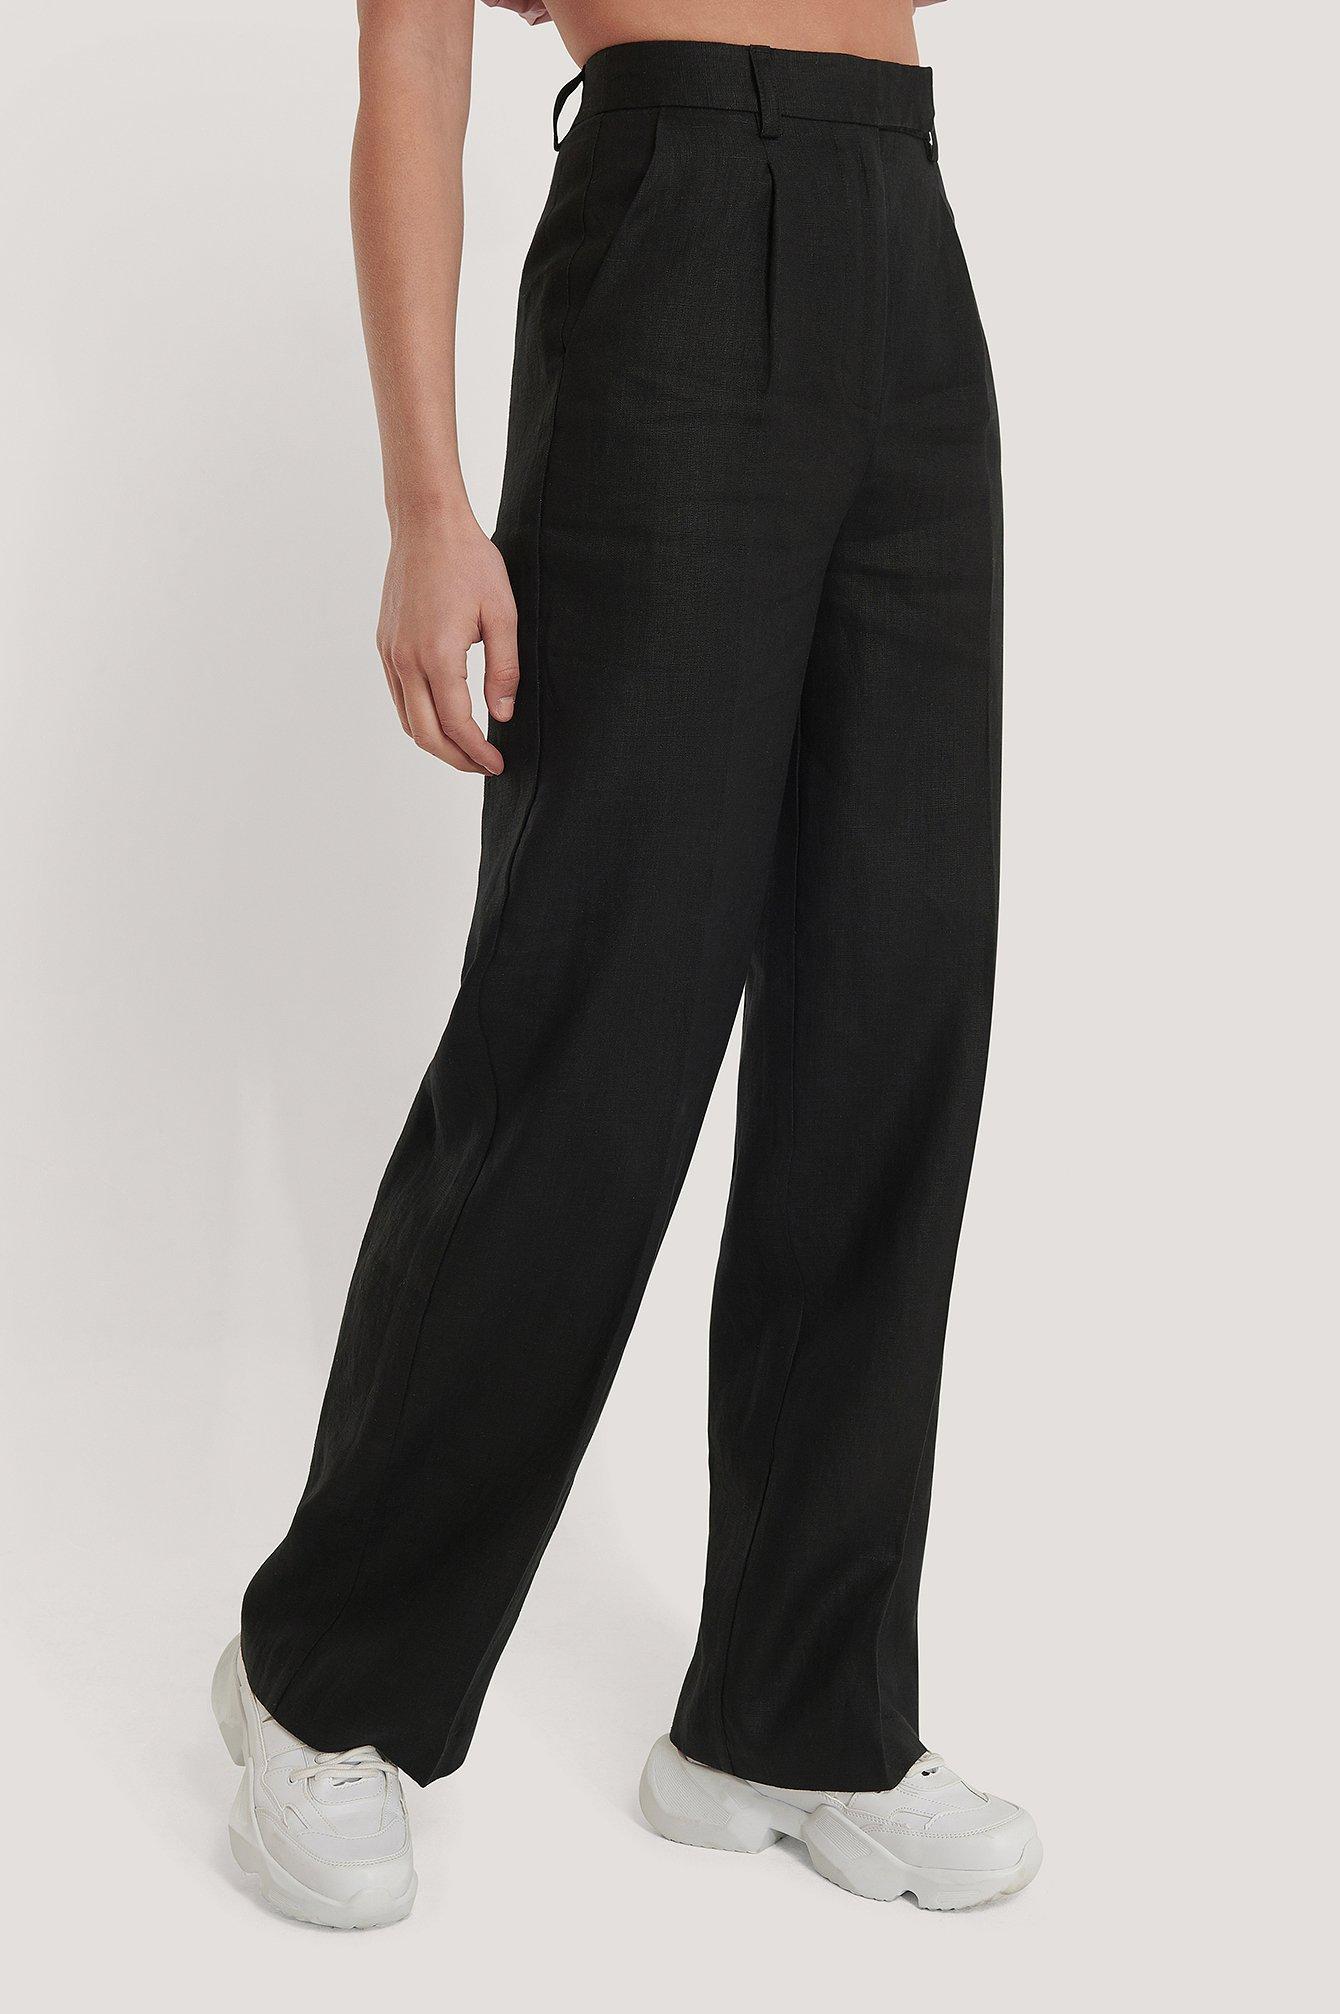 nakd_linen_wide_leg_pants_1594-000400-0002_03h